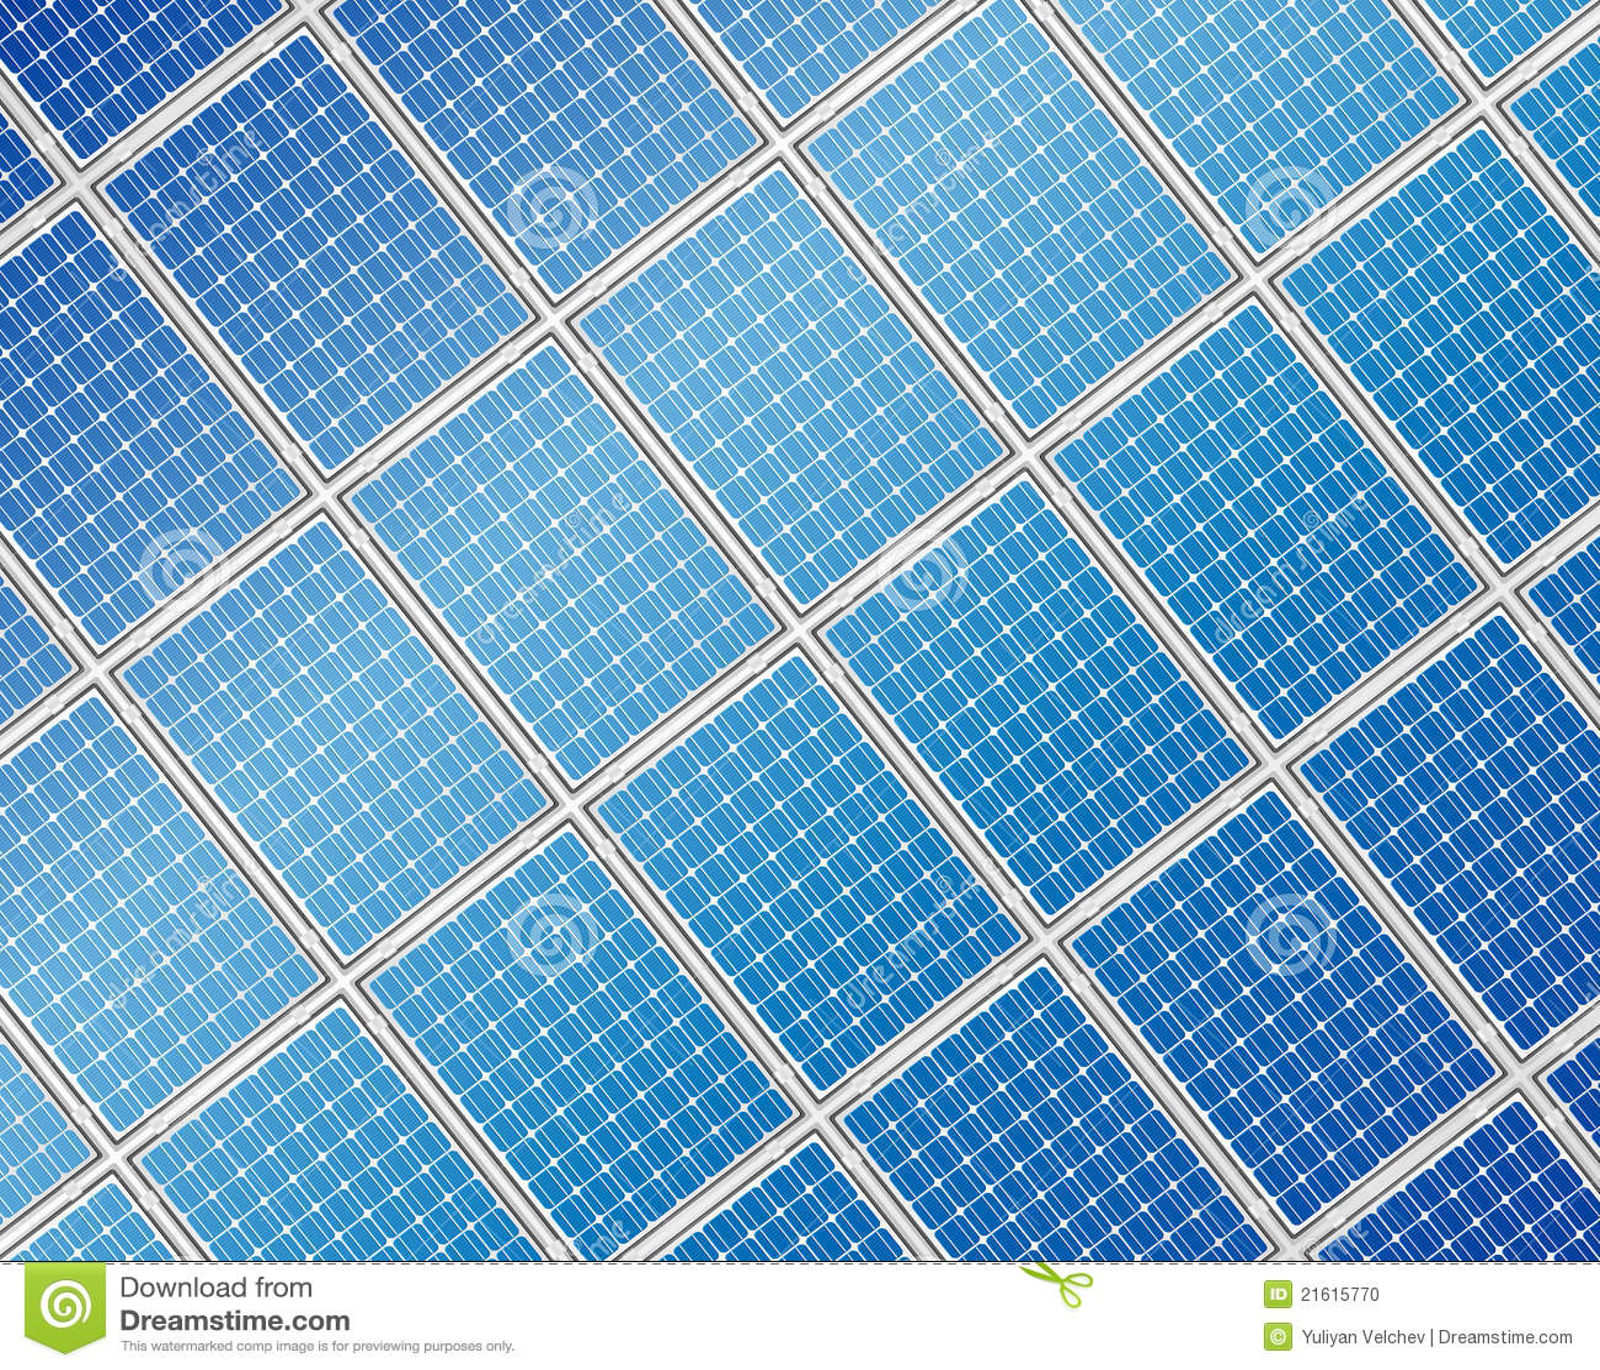 solar panel background - photo #12